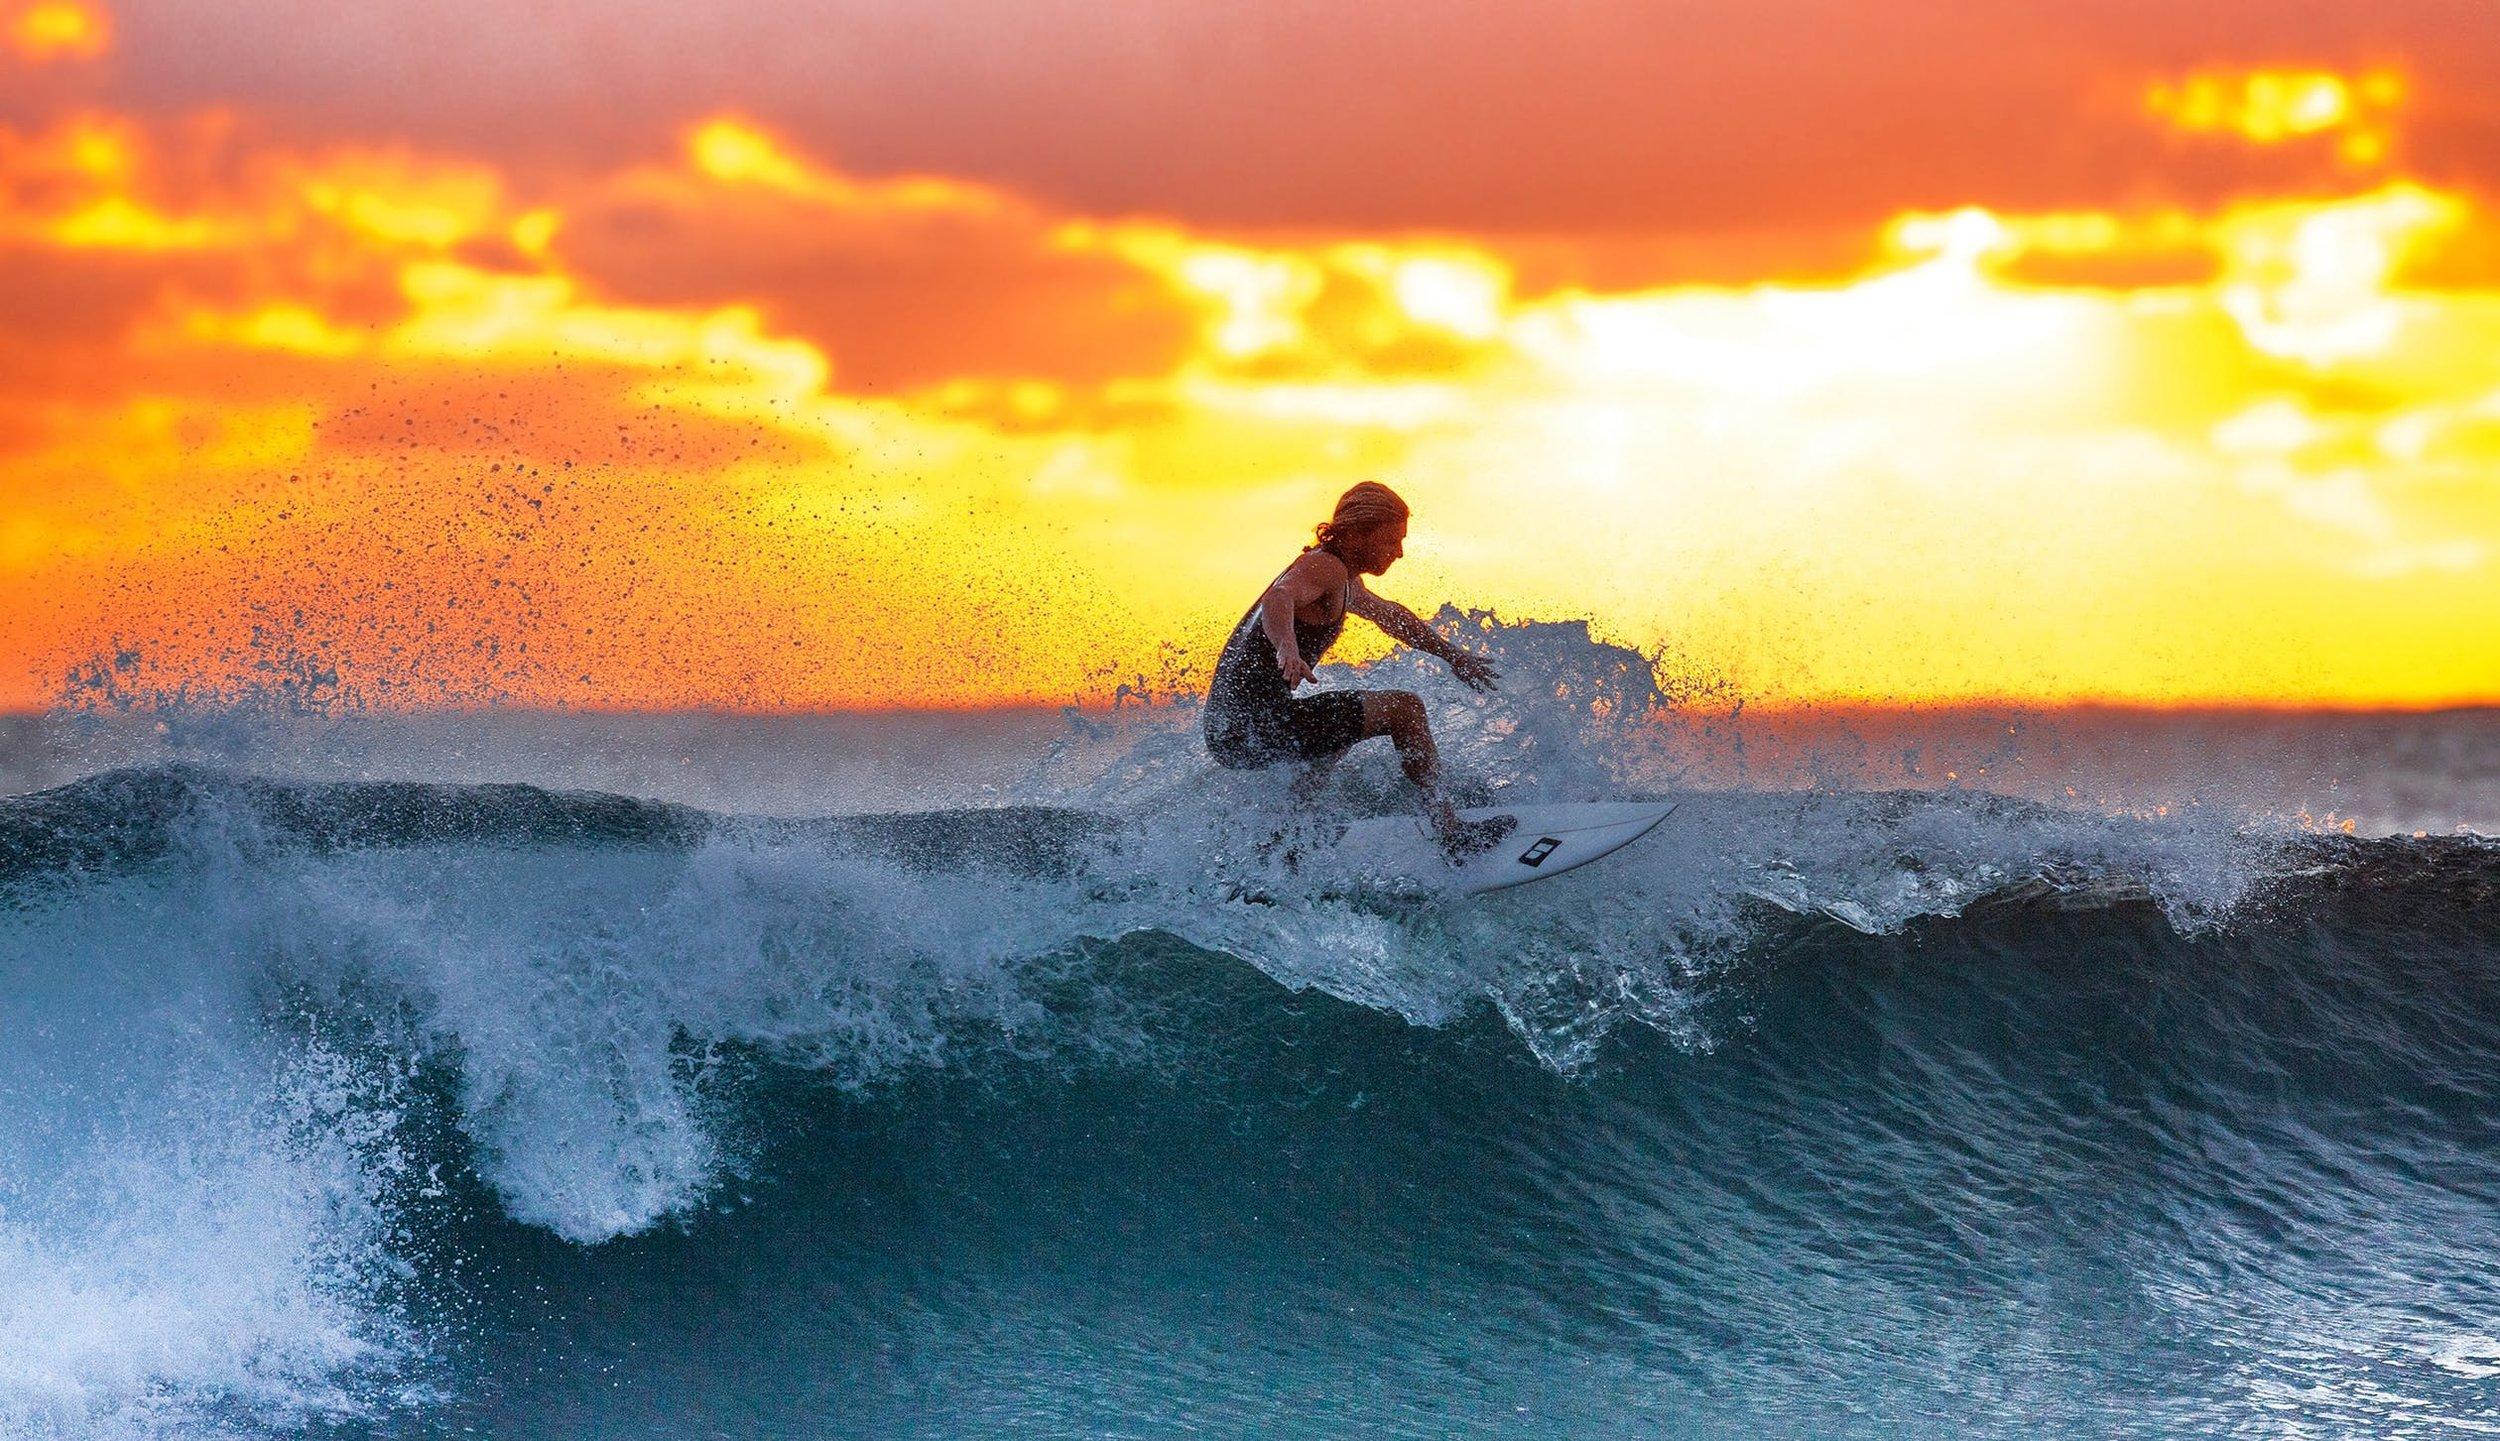 surfer-wave-sunset-the-indian-ocean-390051.jpeg